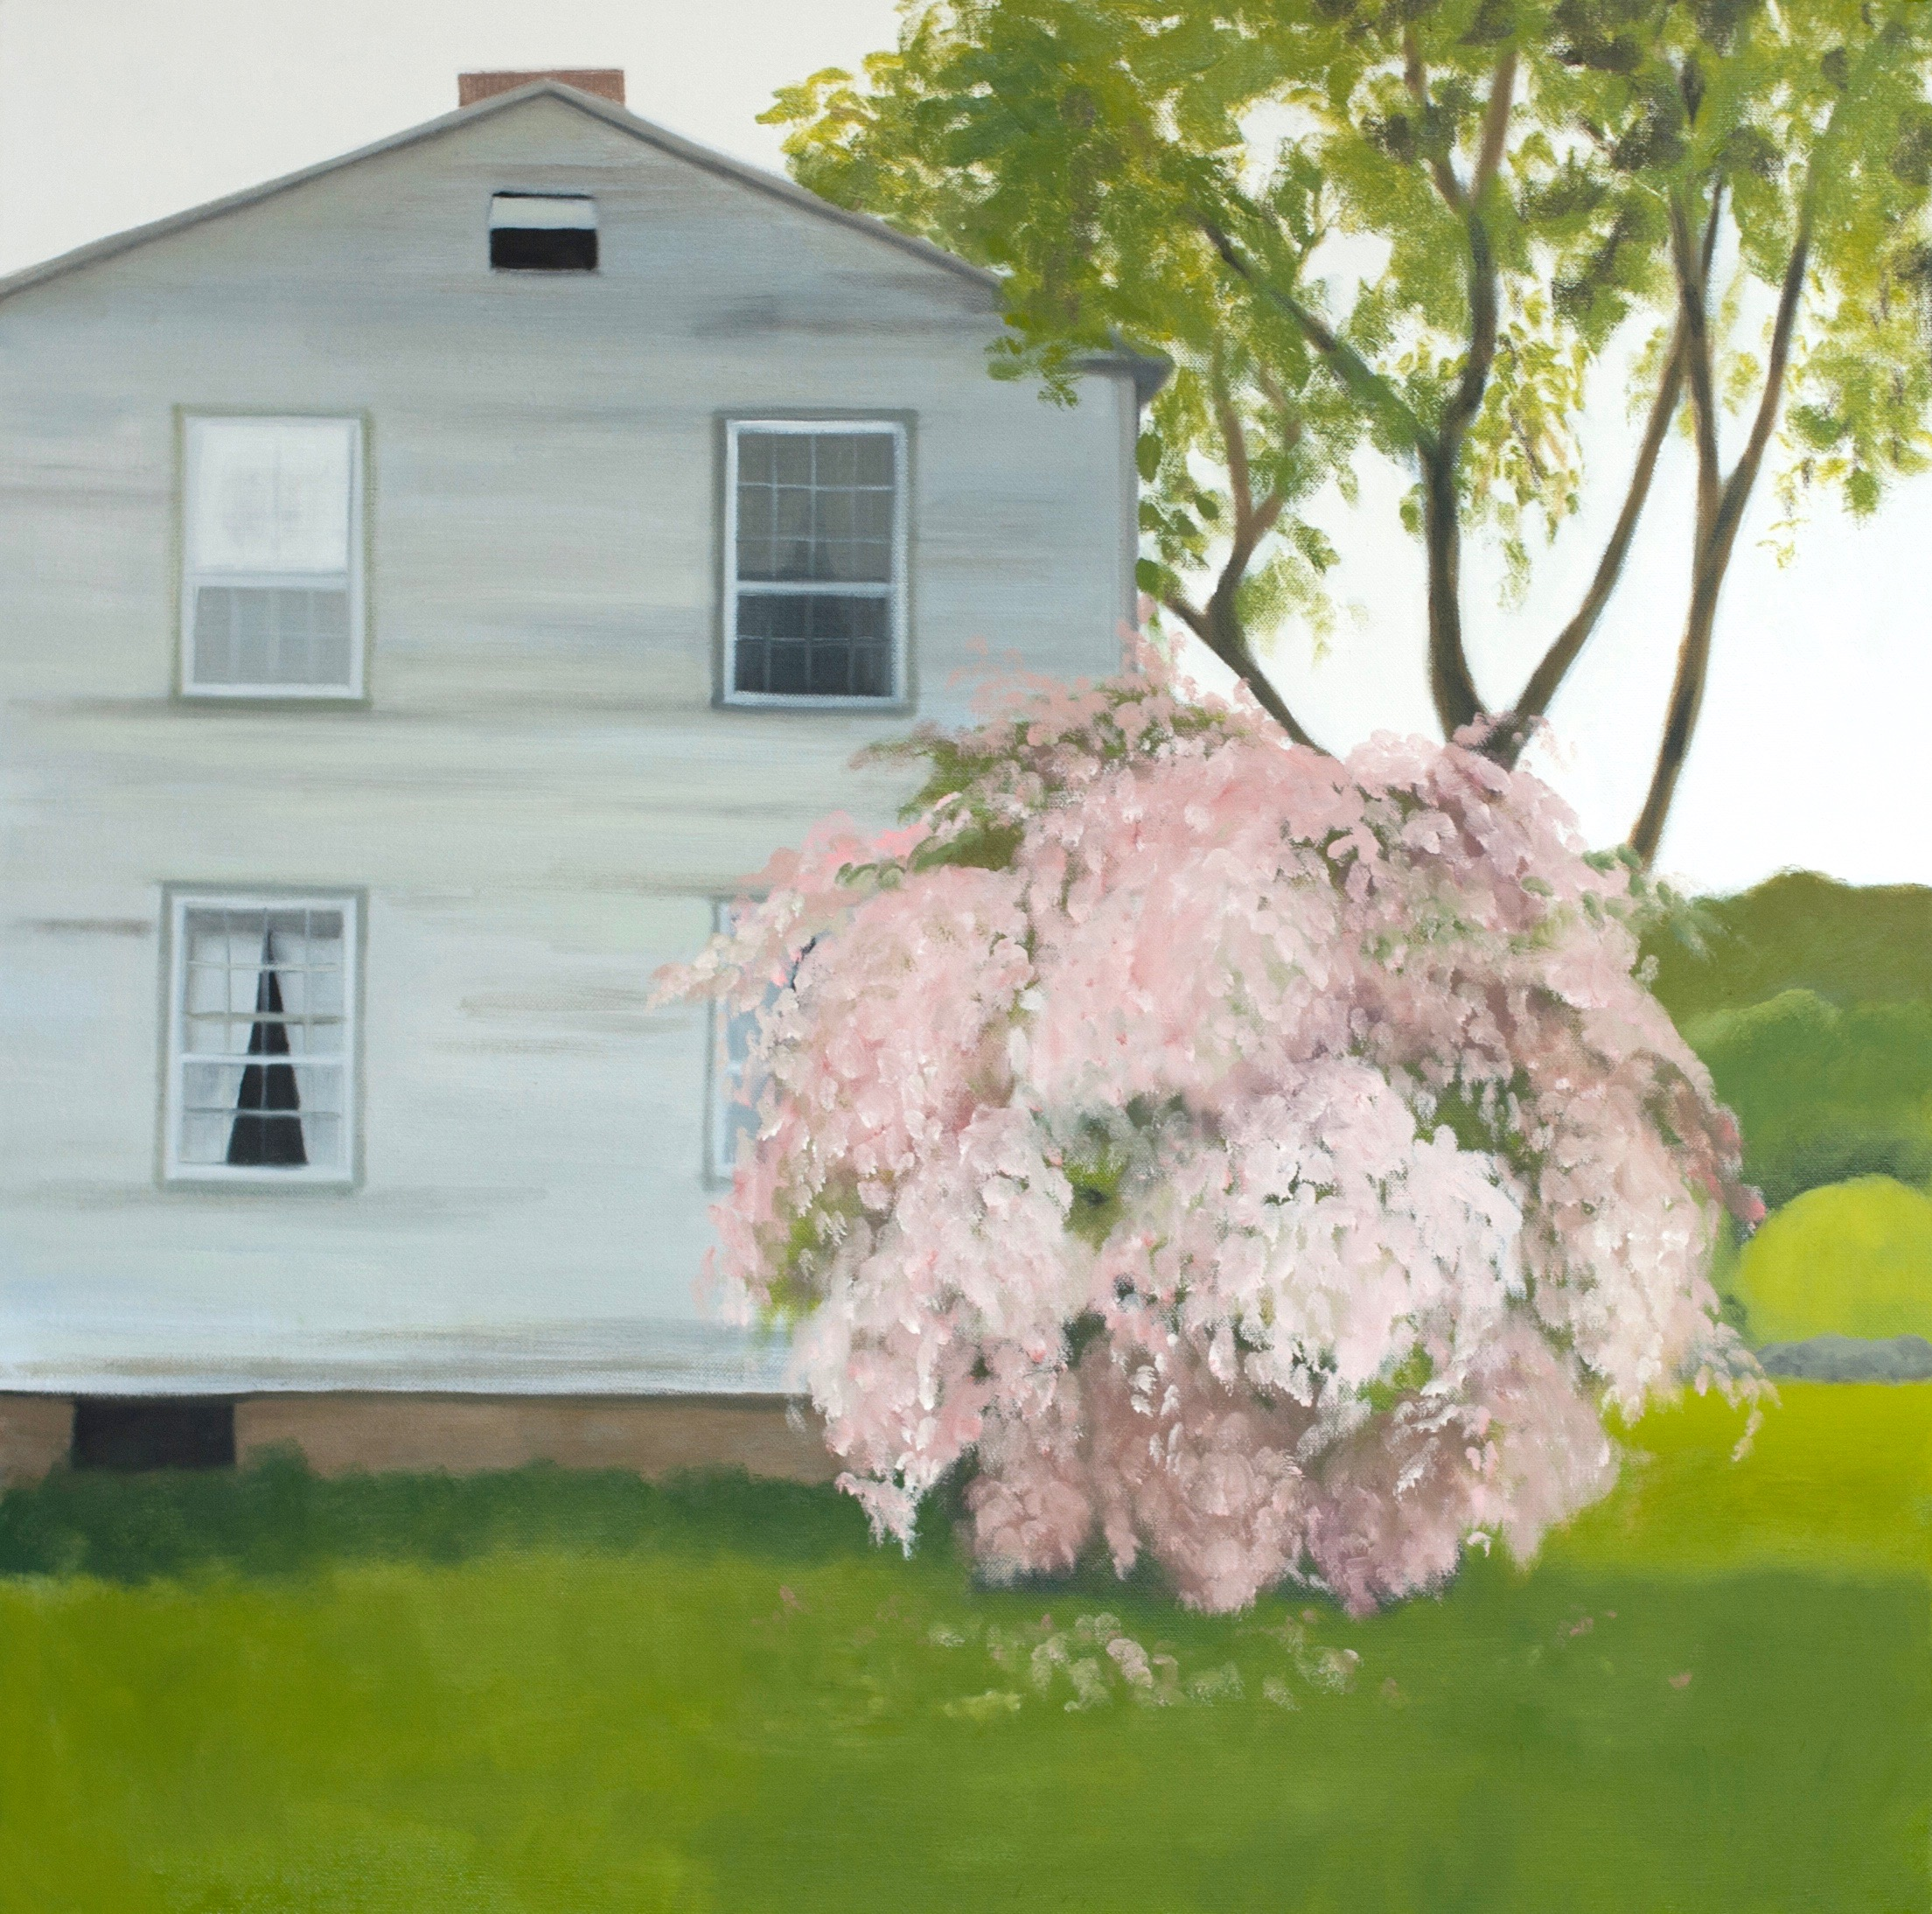 Beauty bush. 30 x 30 inches, oil on canvas. (N/A)